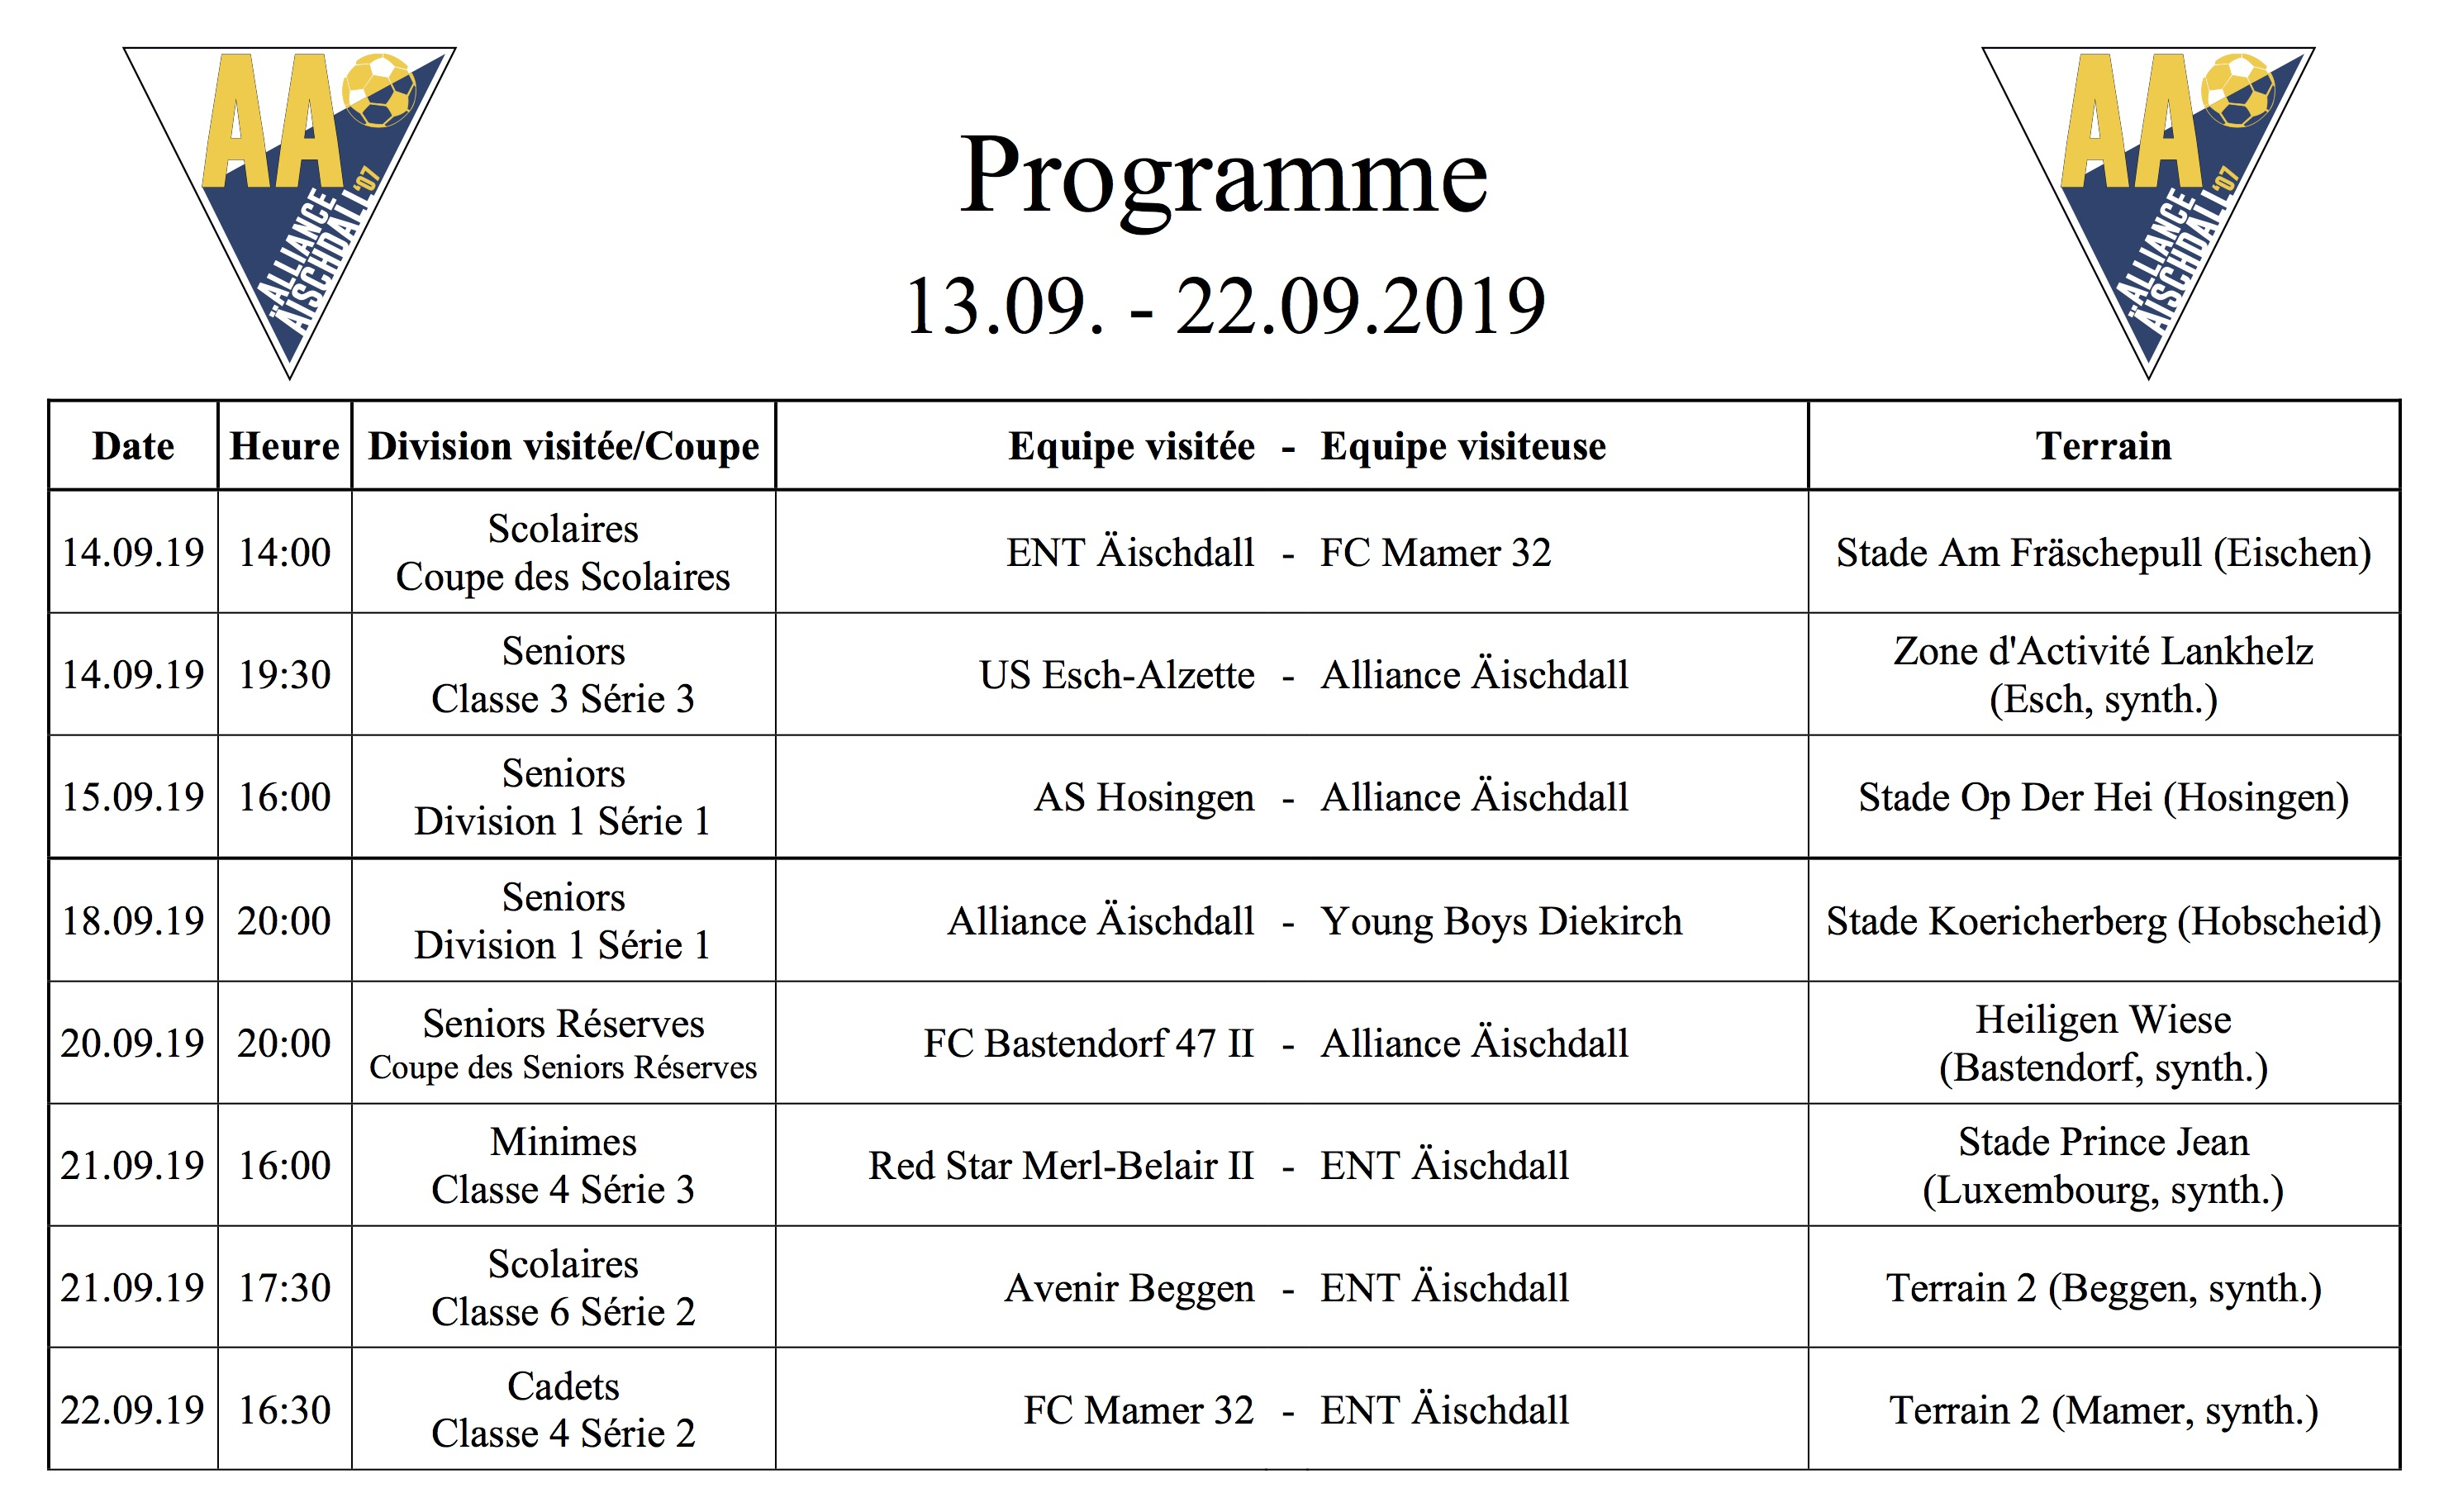 Programm 13.09.-22.09.2019